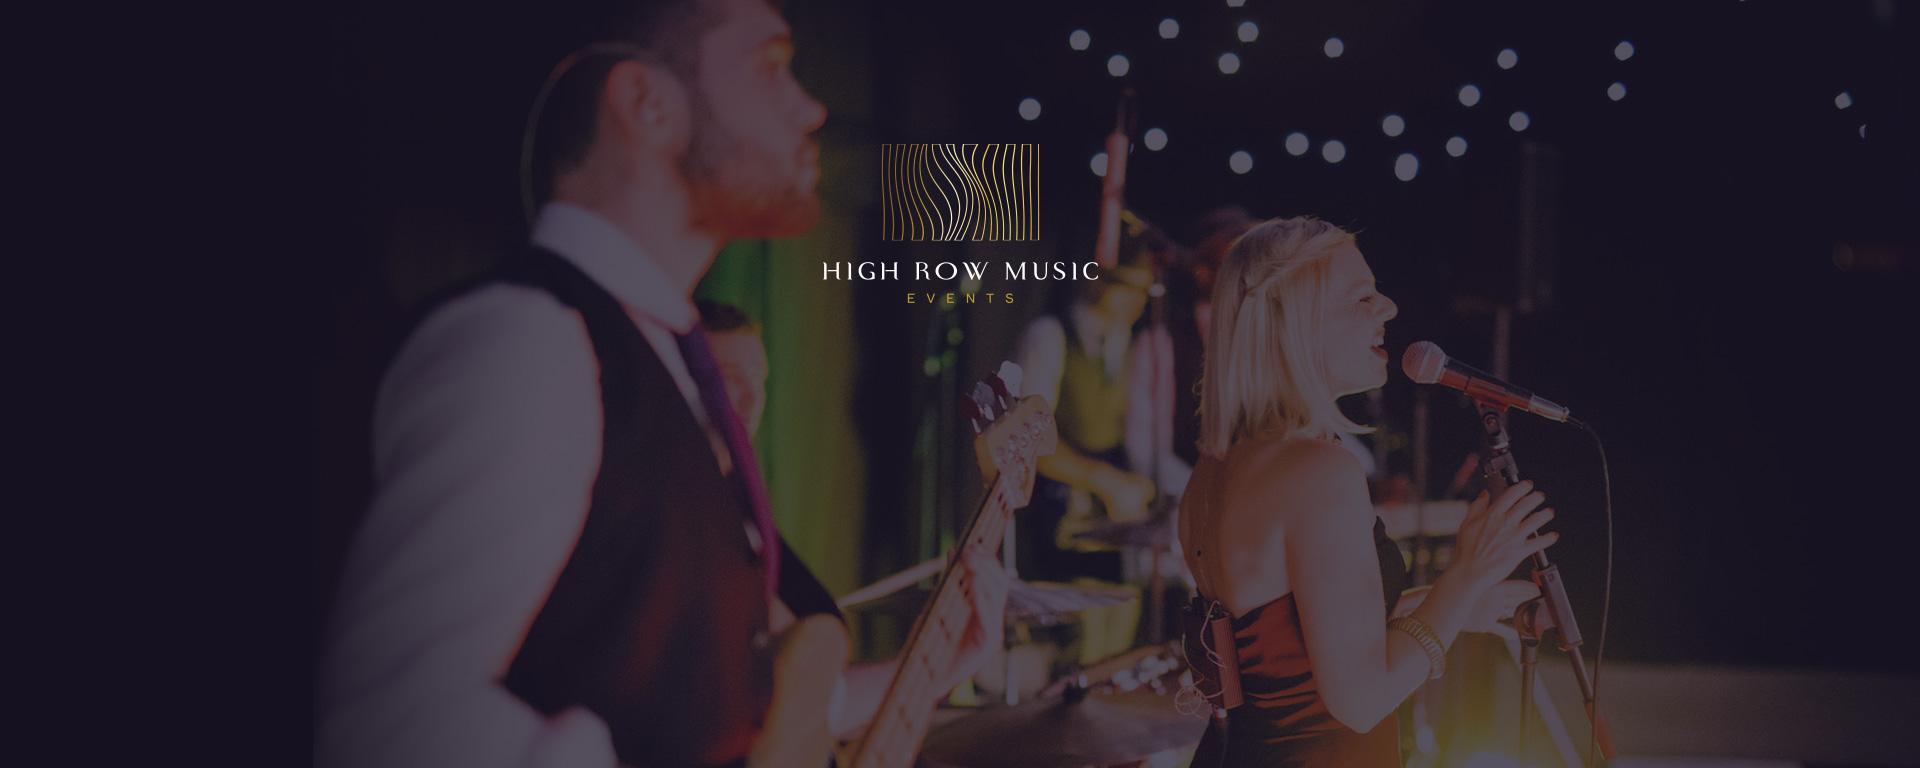 High Row Music Event